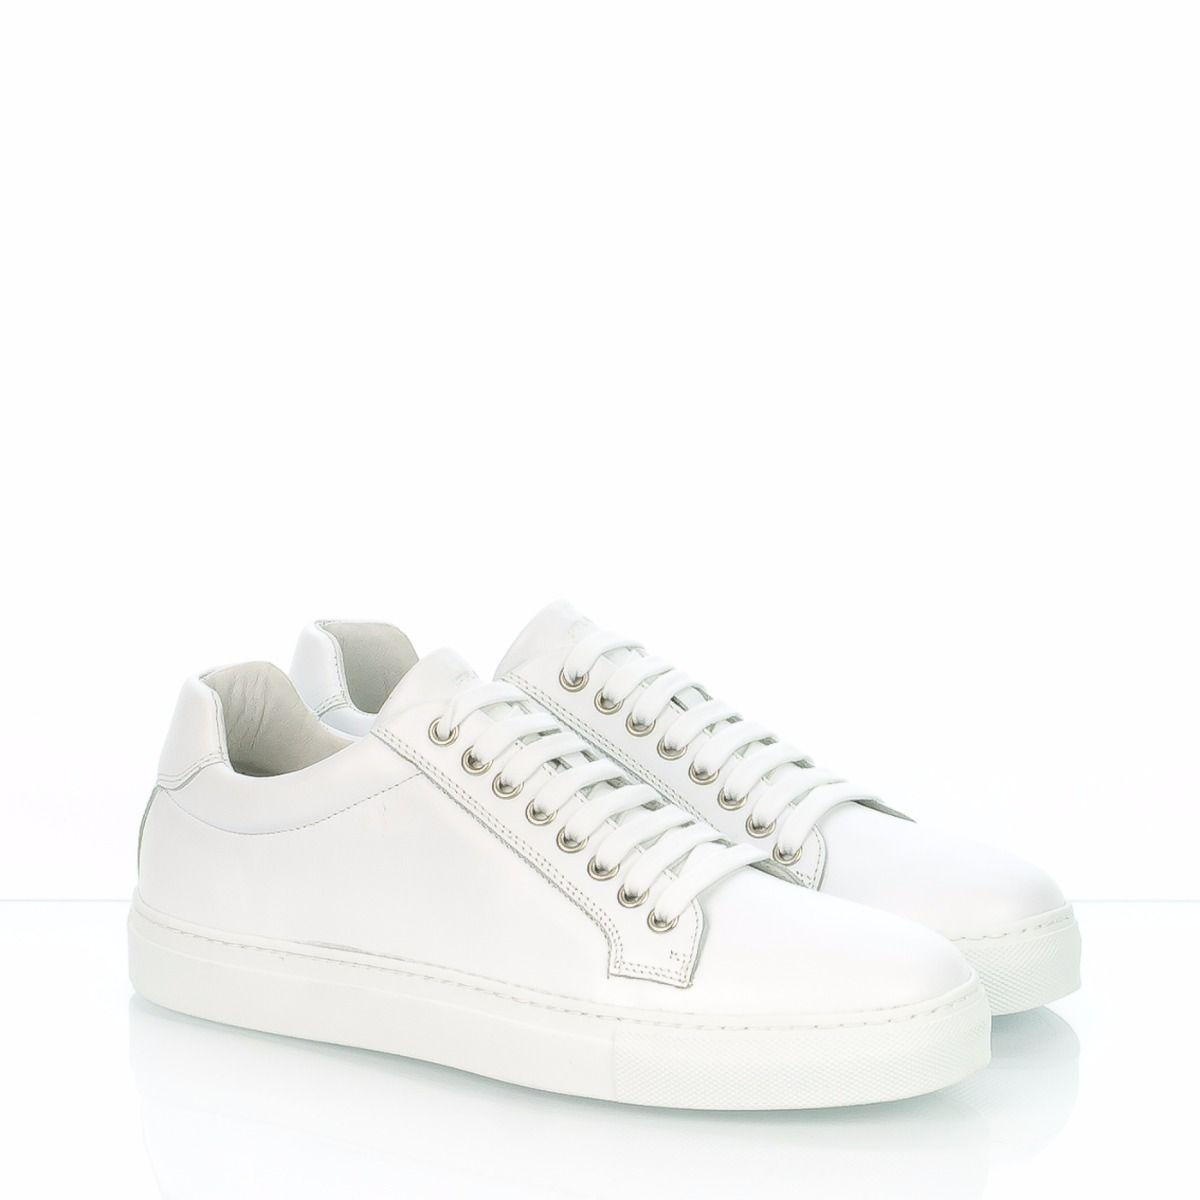 Bianco 29n9 Frau Sneakers Uomo Pelle shdCQtxr